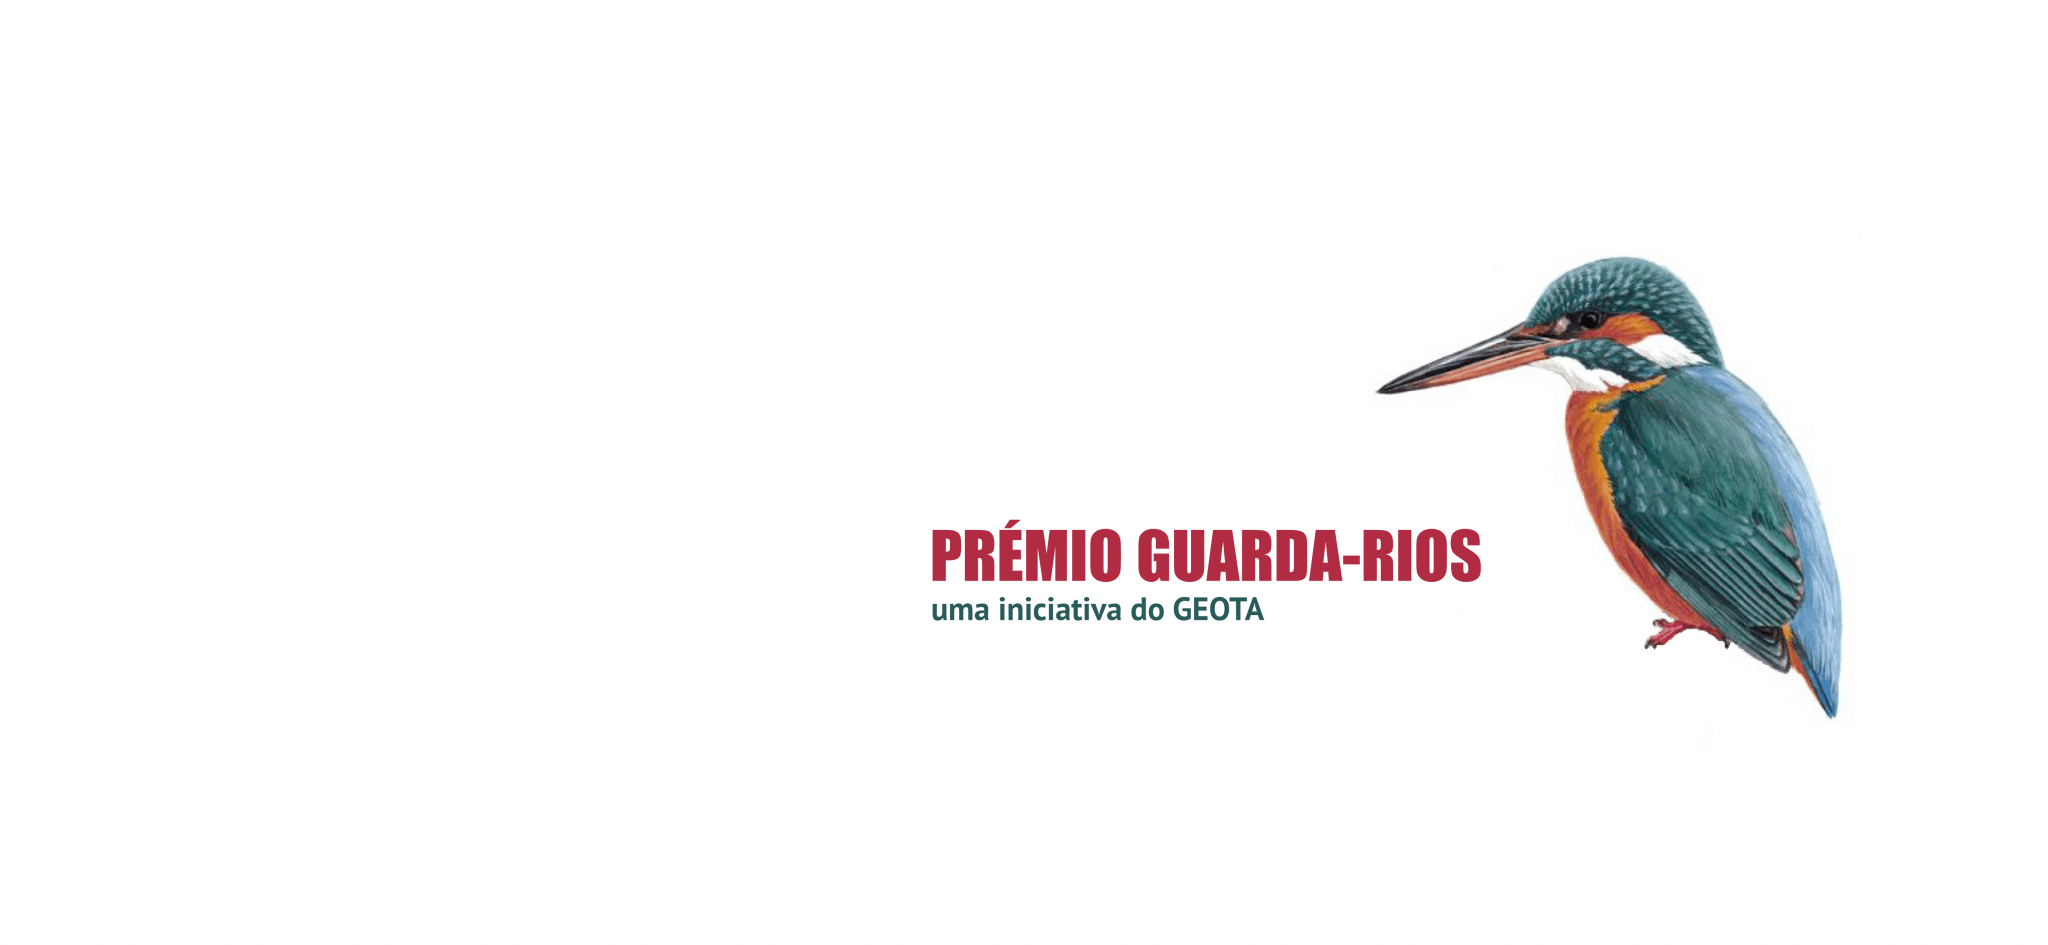 Prémio Guarda-Rios 2018